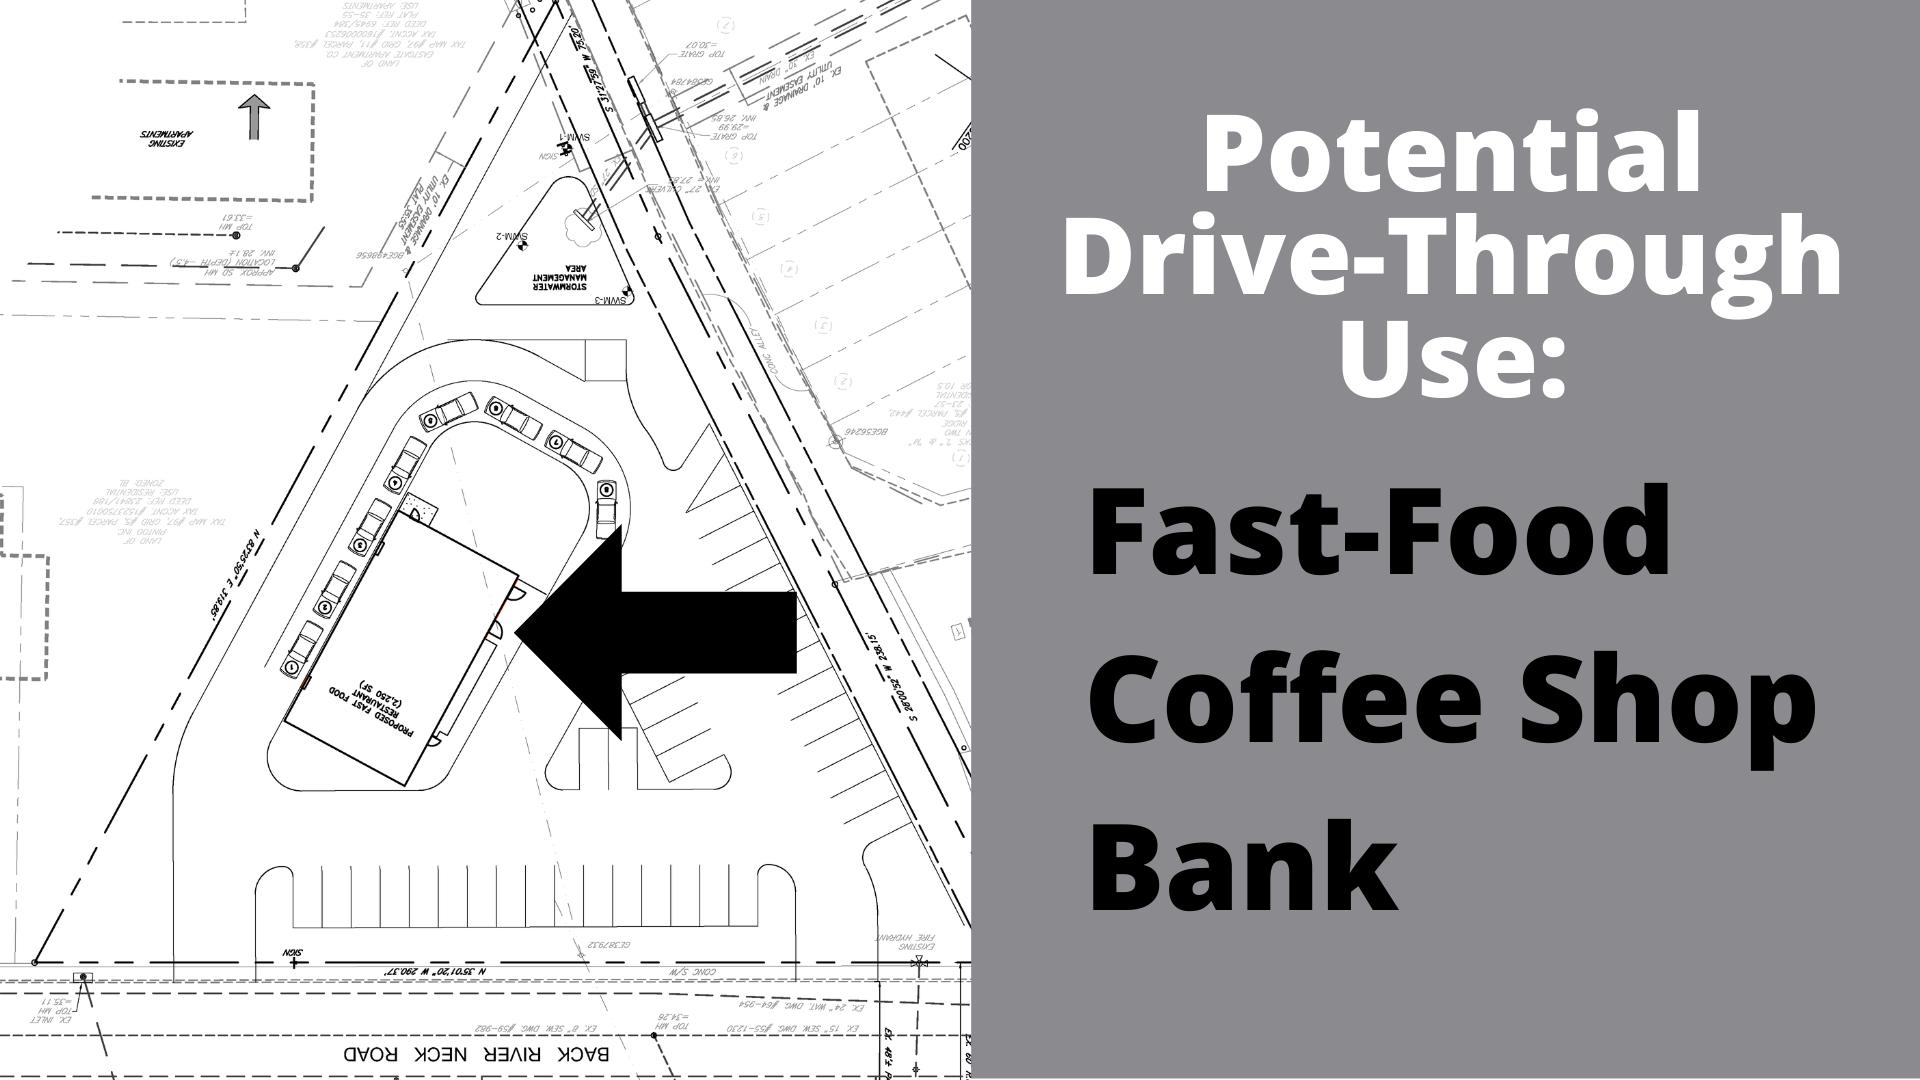 Fast Food Coffee Shop Bank